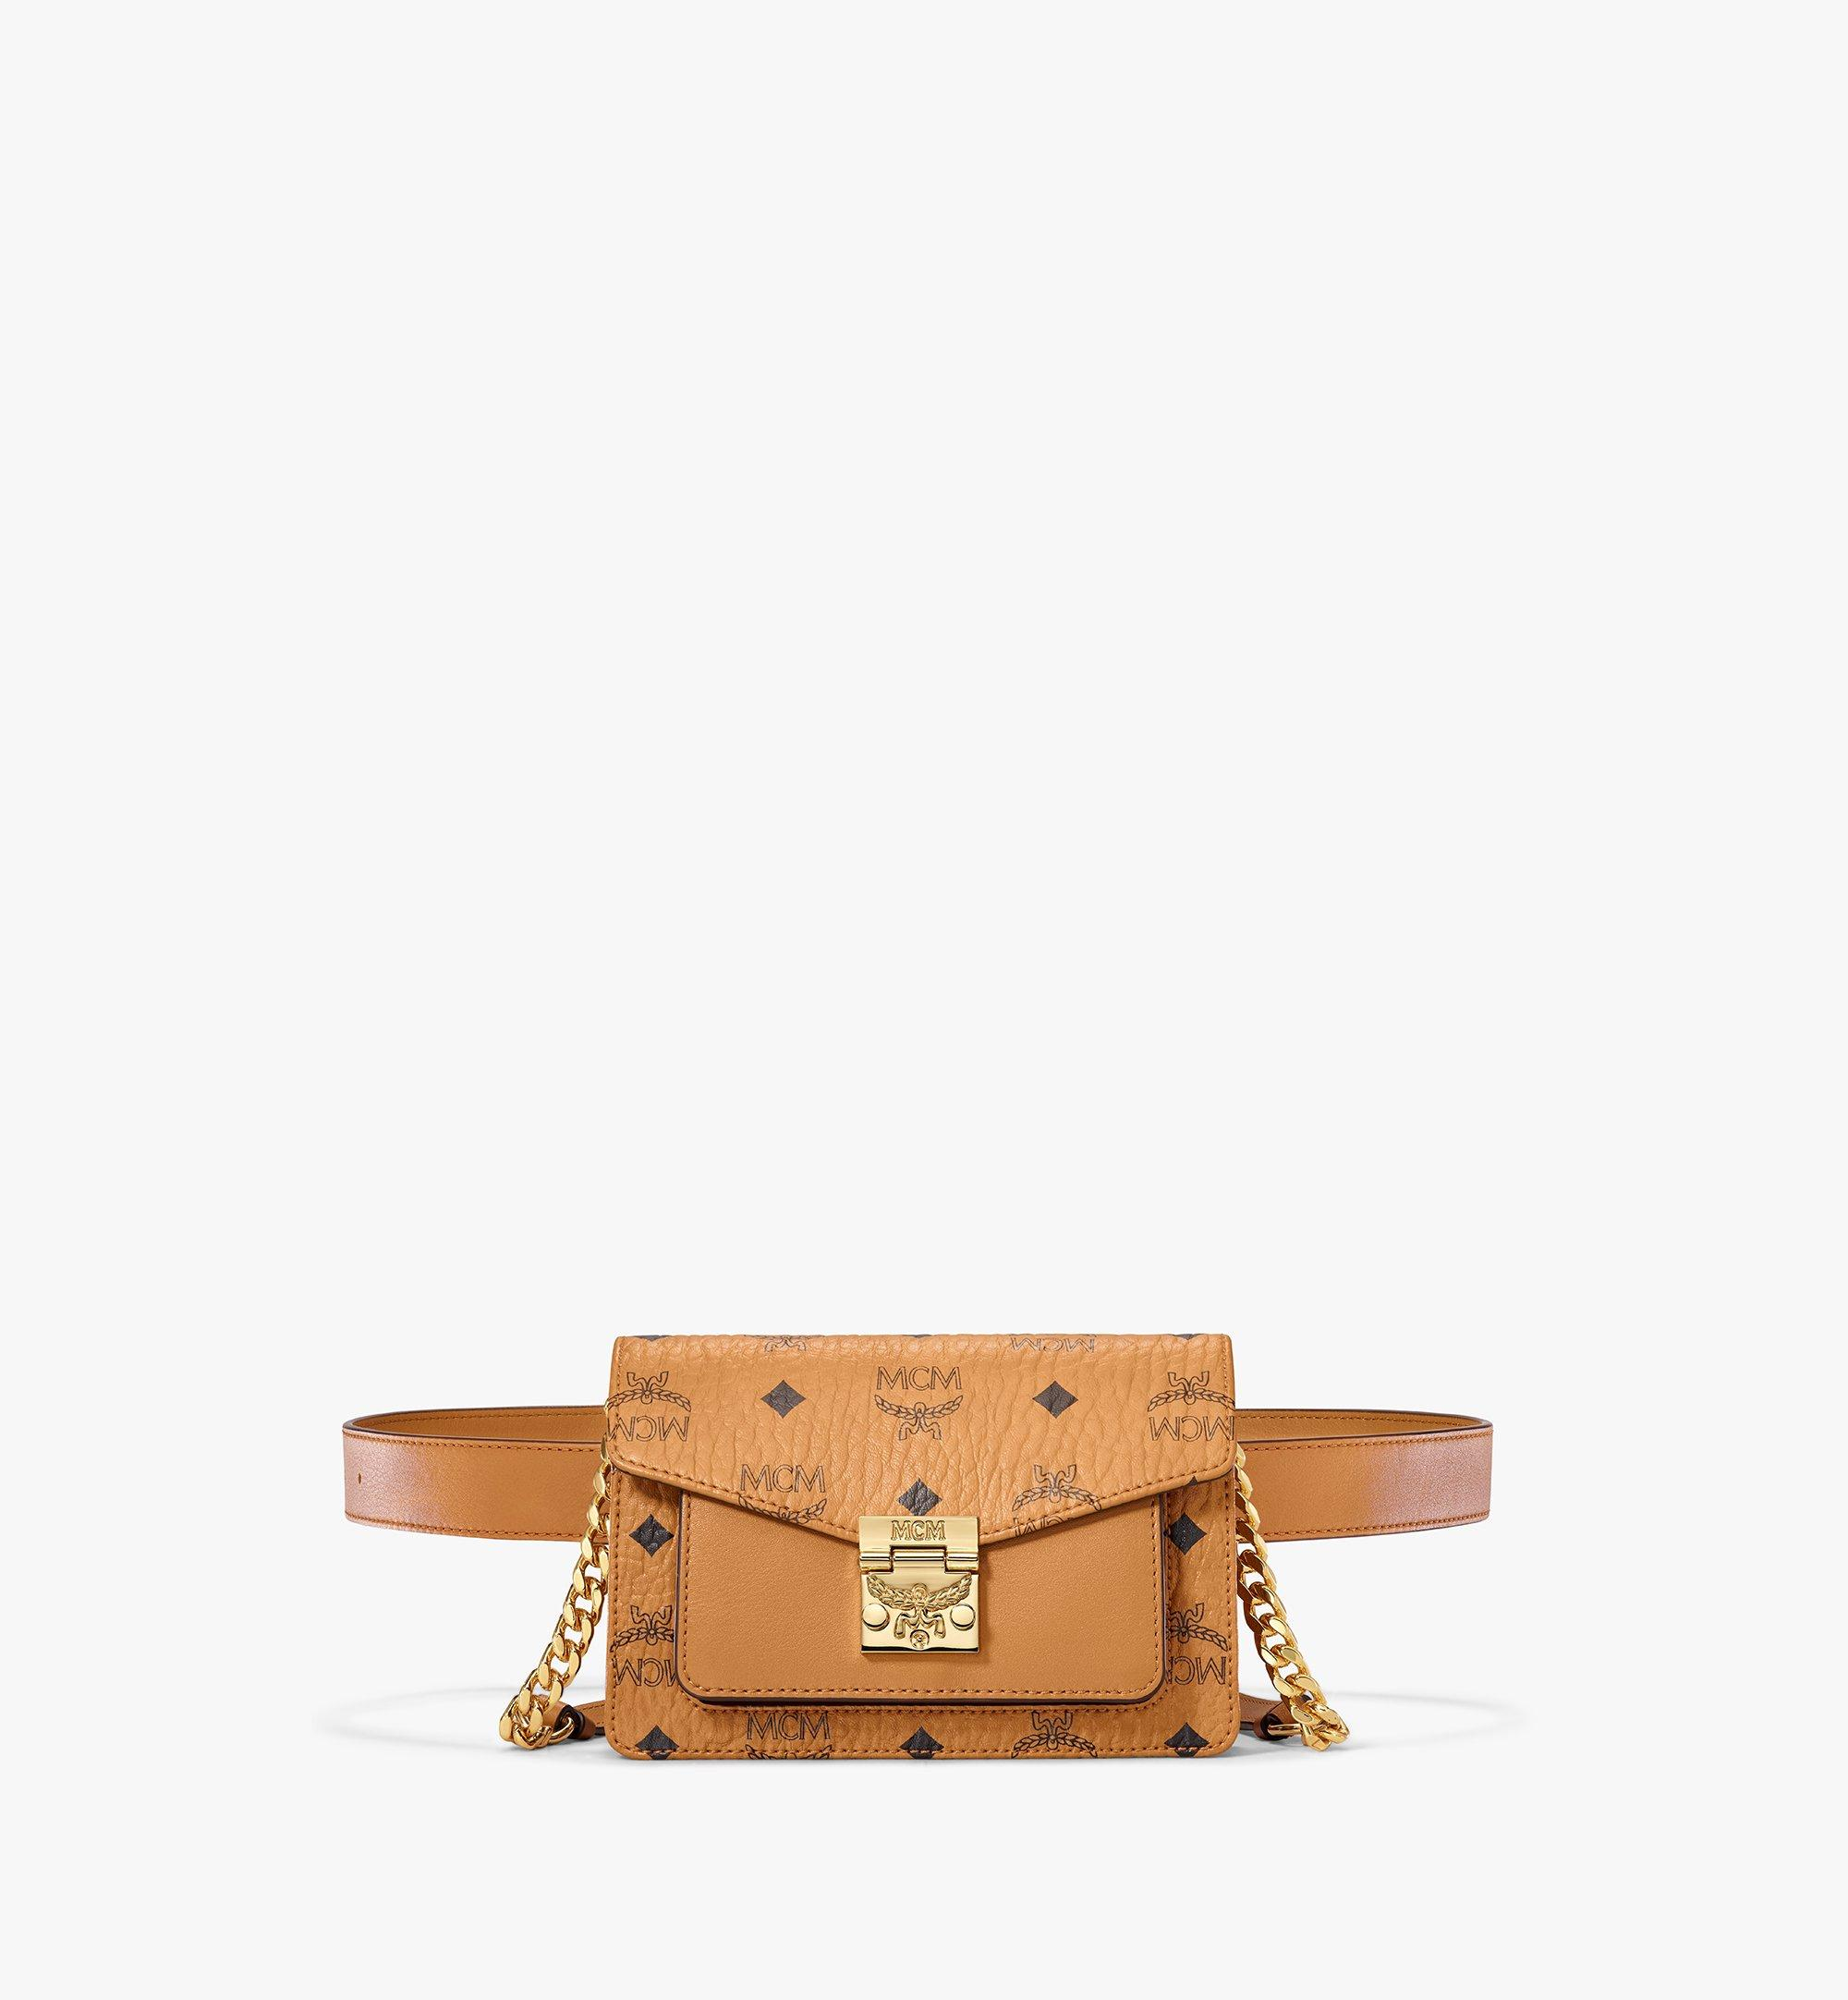 MCM Patricia Belt Bag in Visetos Cognac MWZAAPA01CO001 Alternate View 1